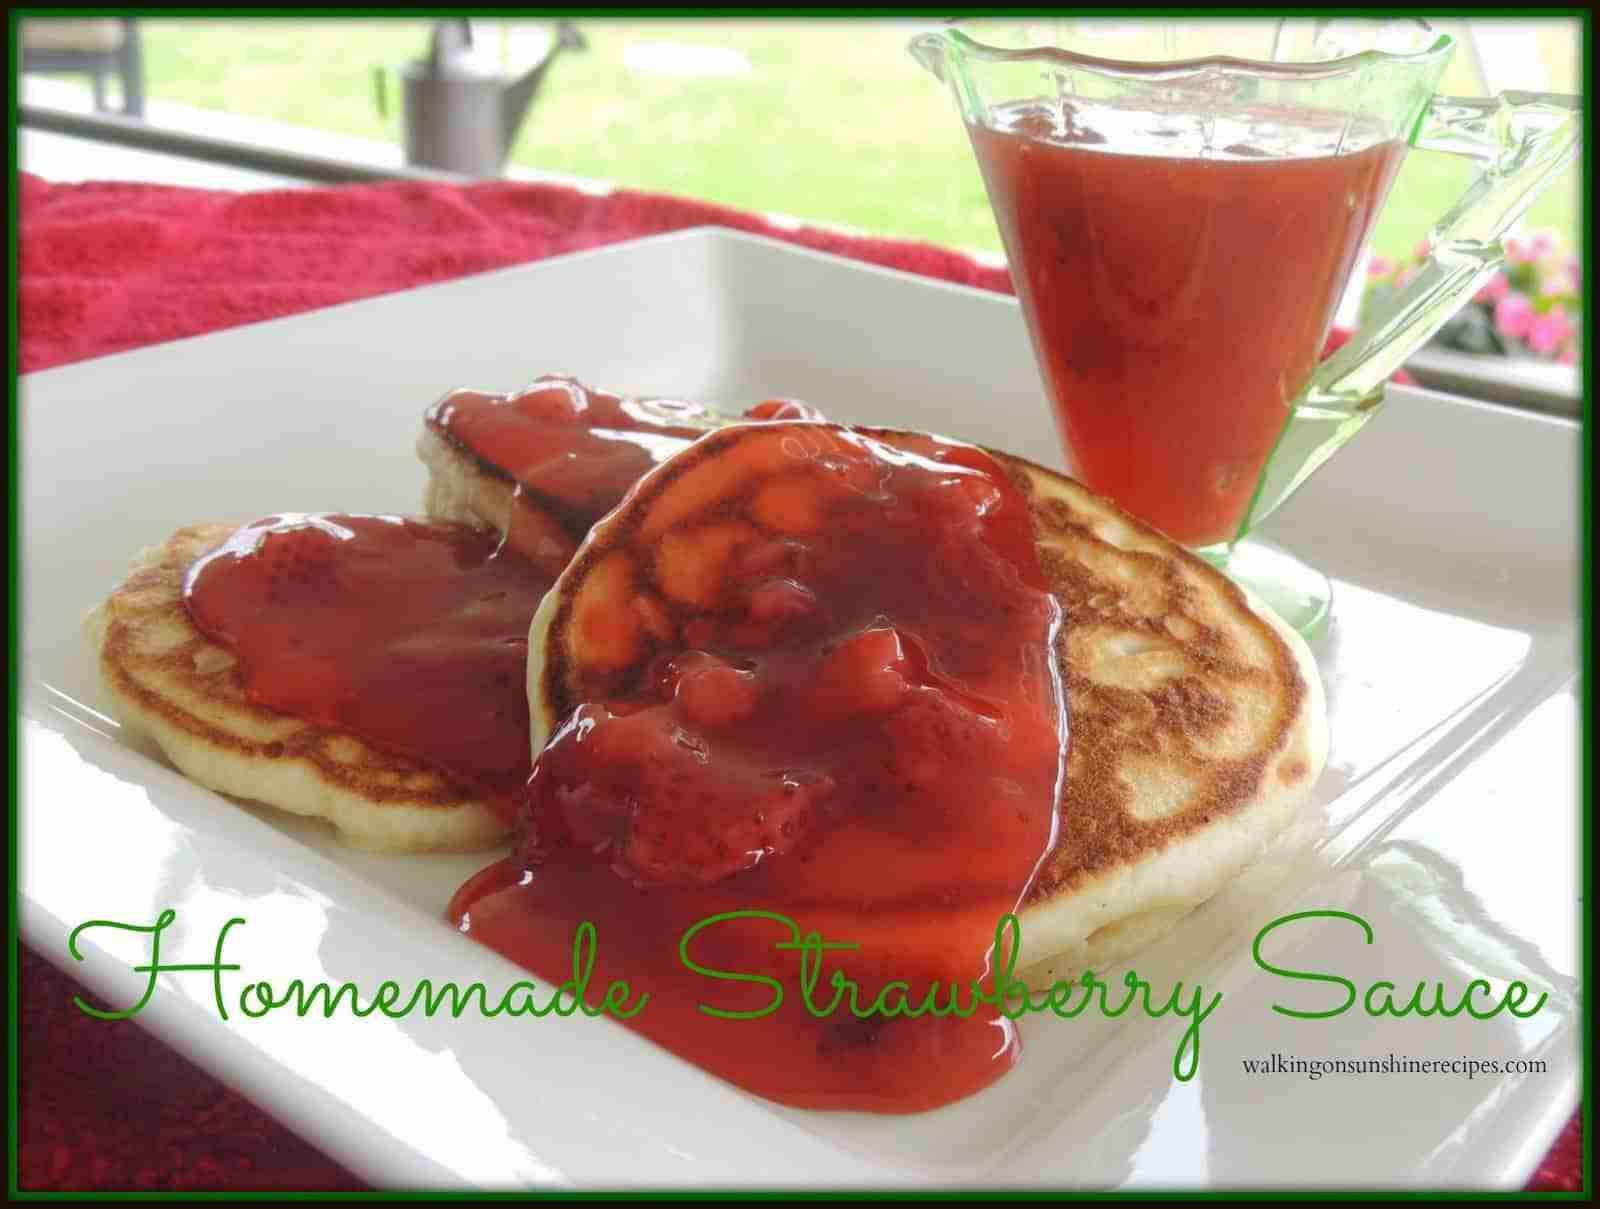 strawberry sauce 4 promo